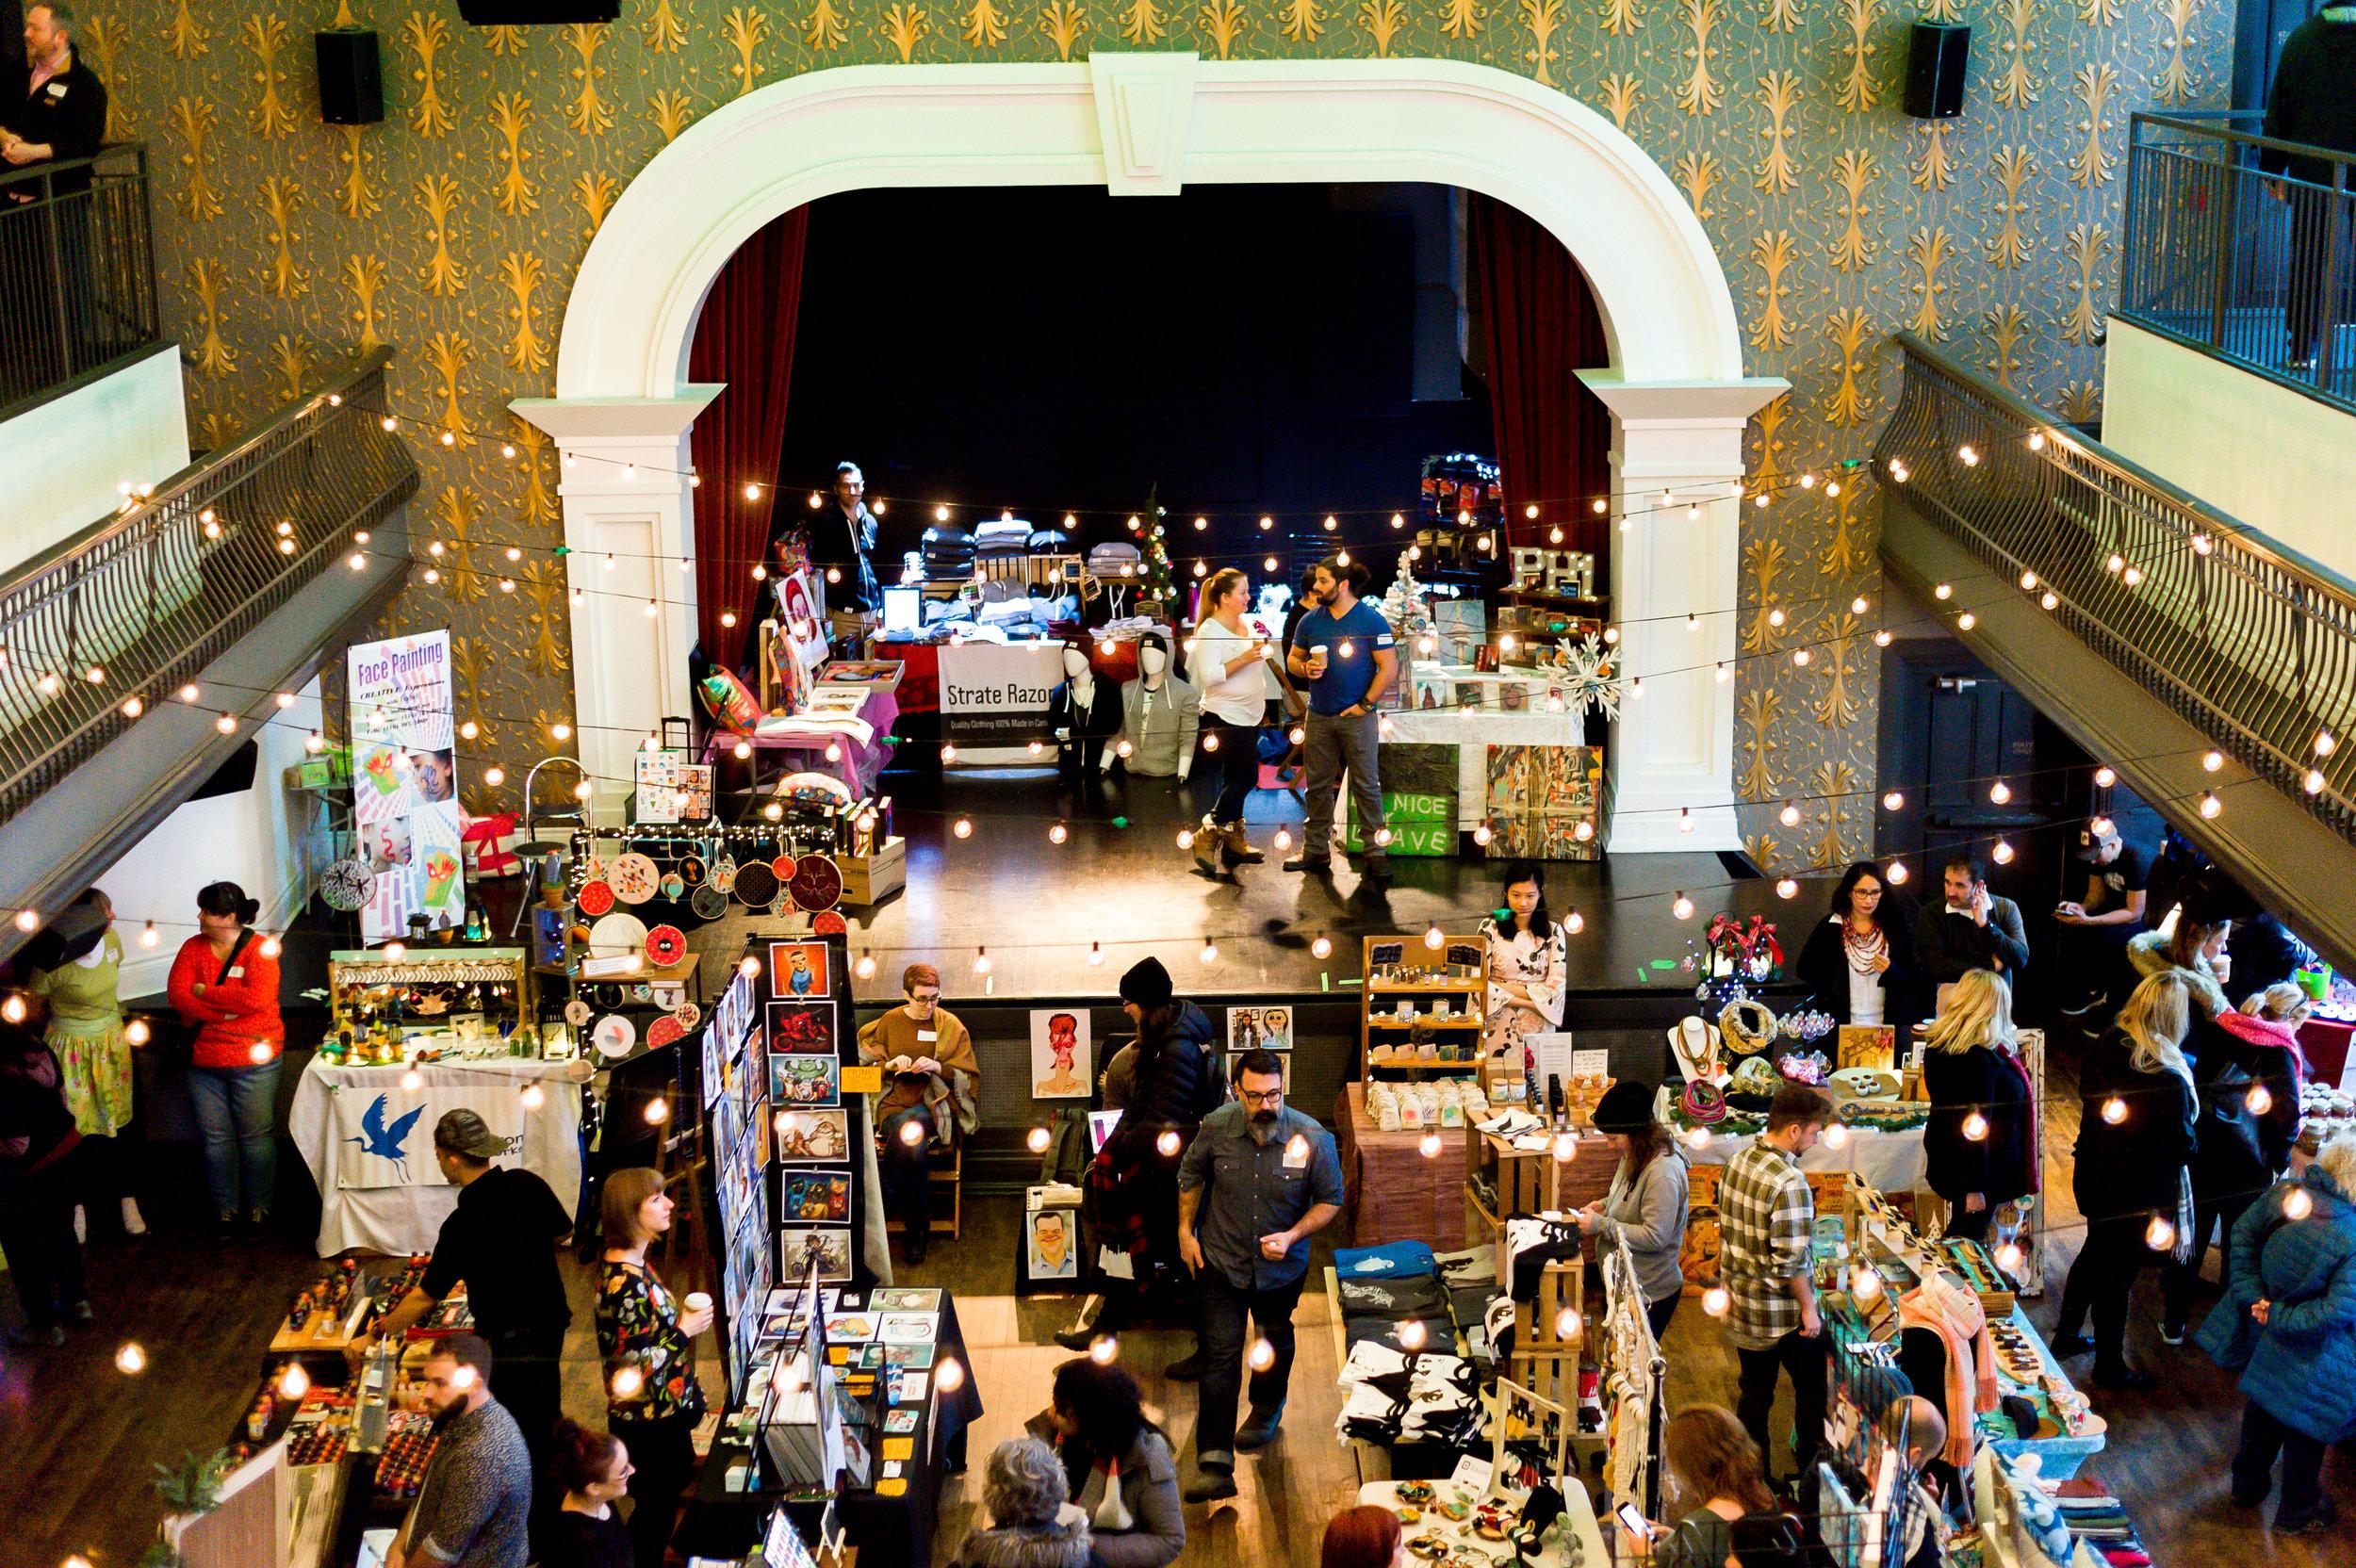 Toronto Art Crawl - Christmas Market-11.jpg